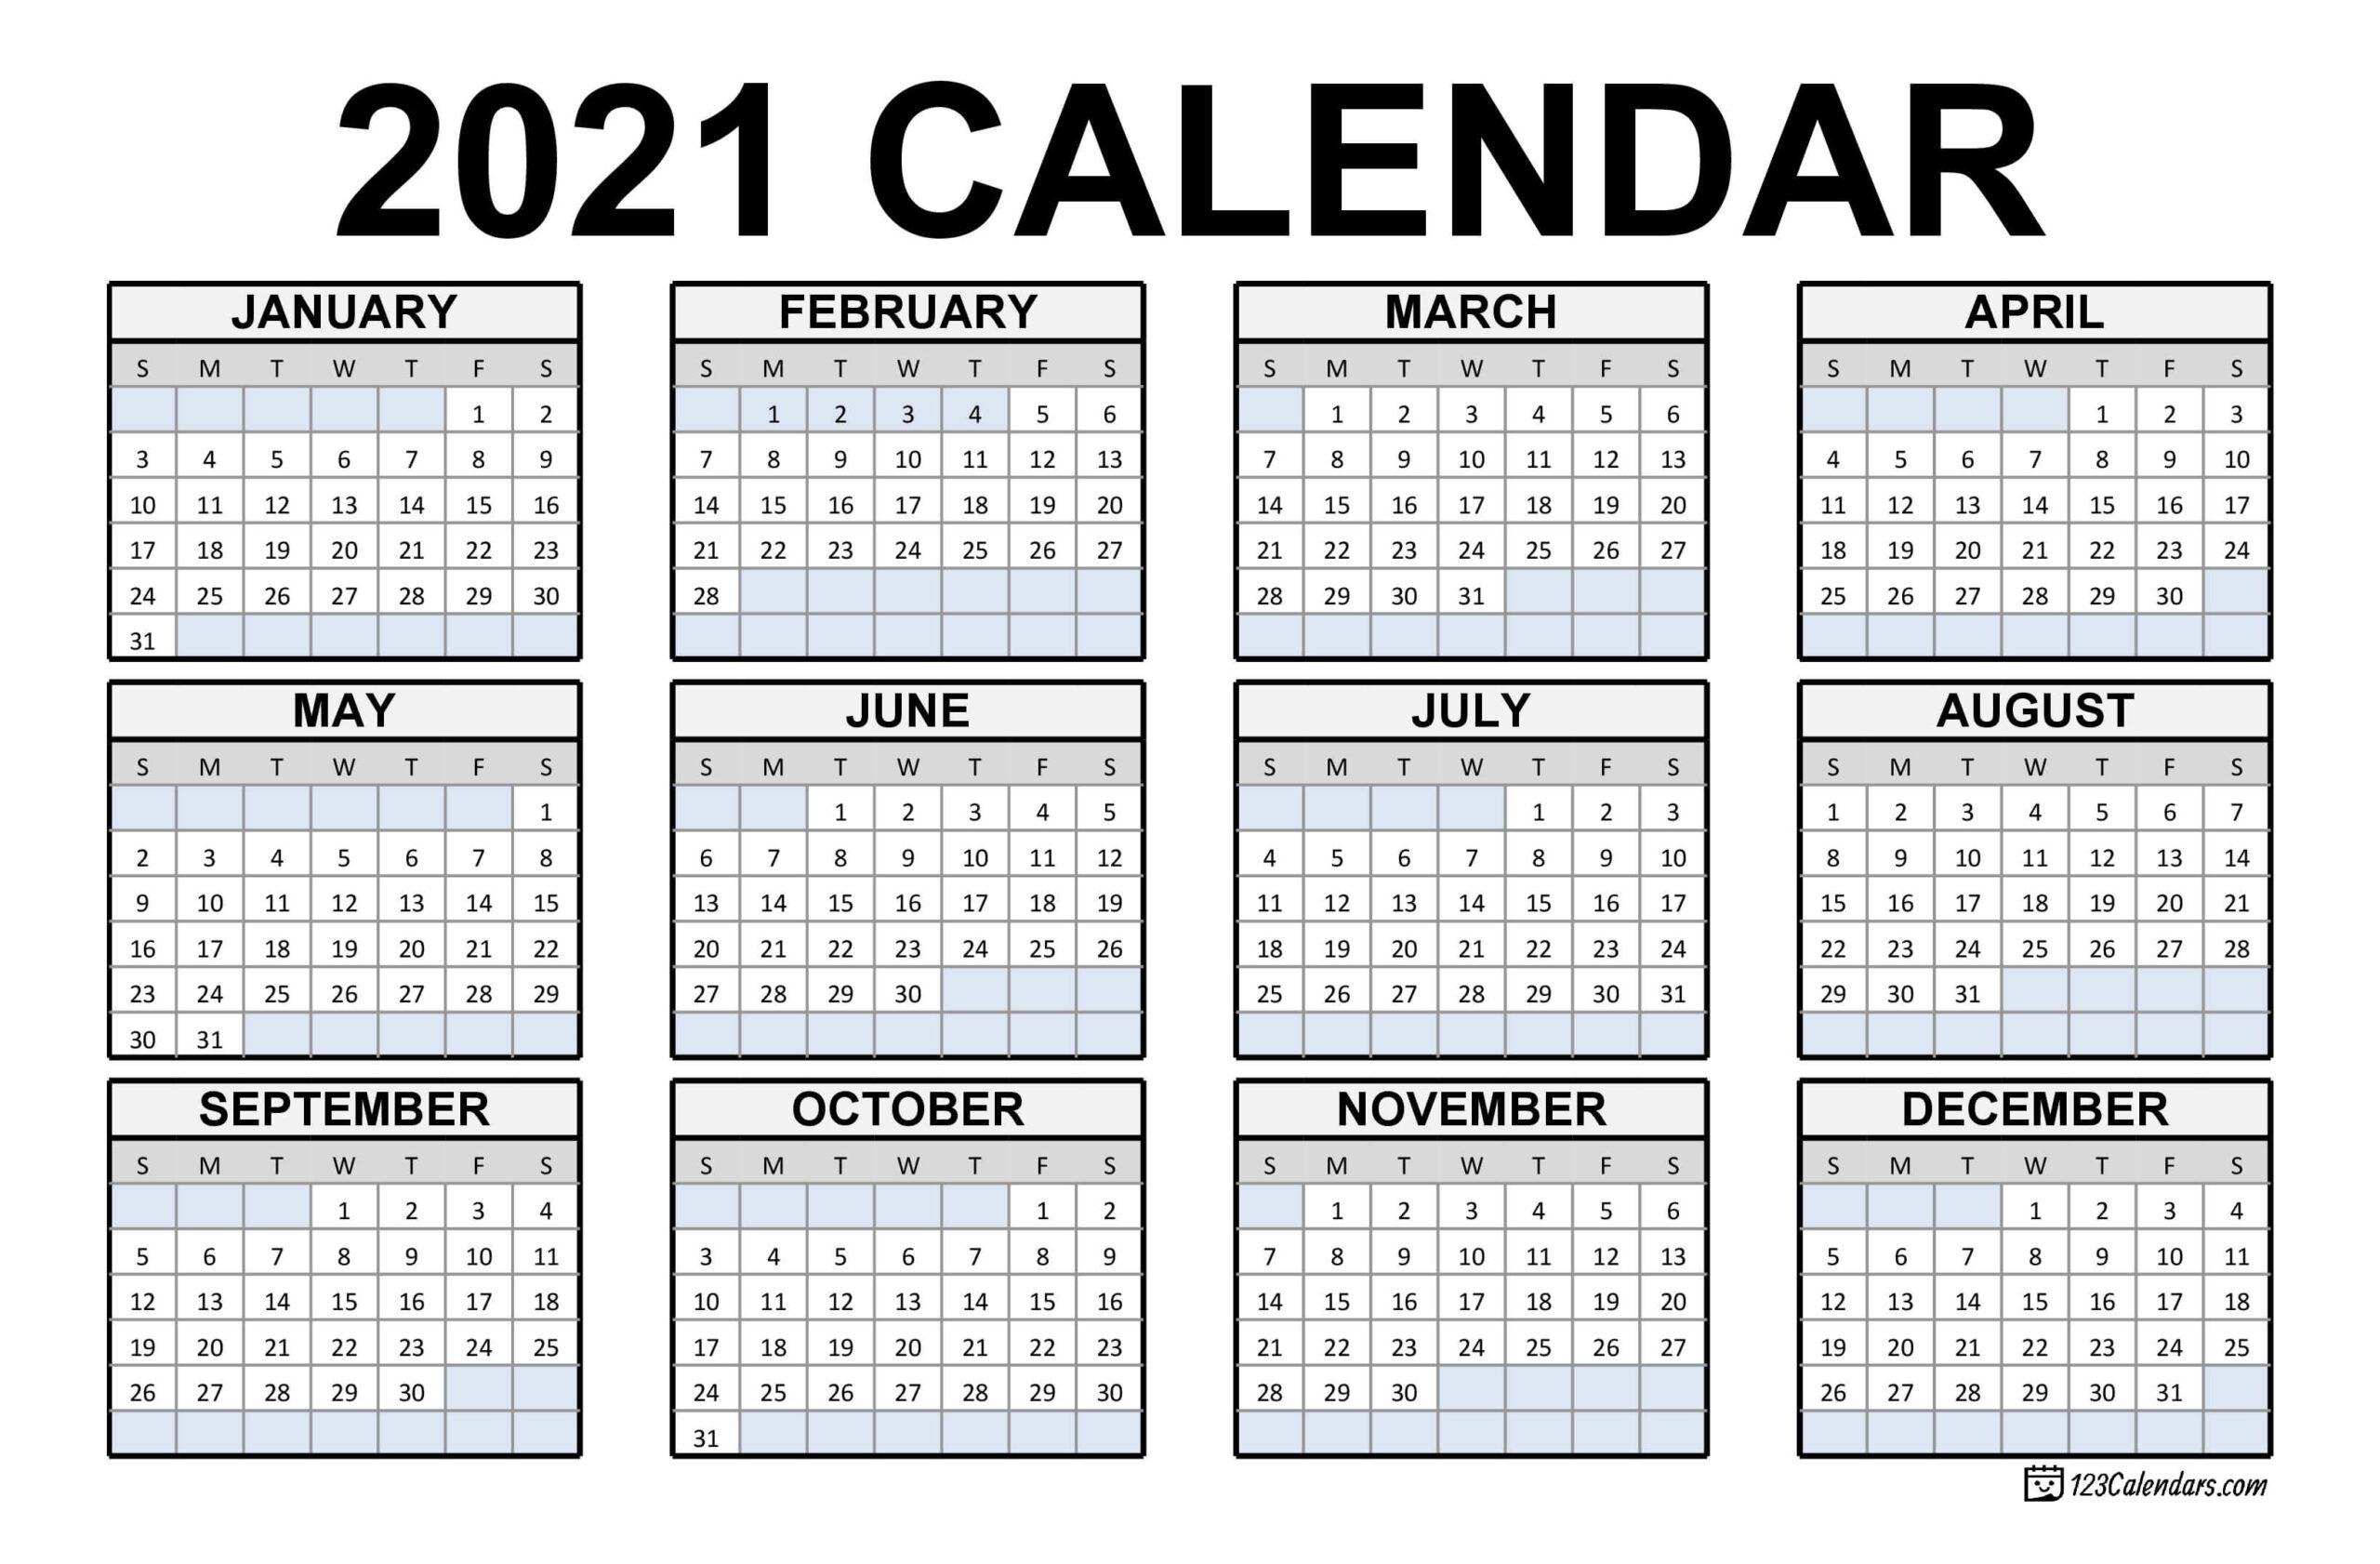 2021 Printable Calendar | 123Calendars intended for Printable Pocket Size Calendar 2021